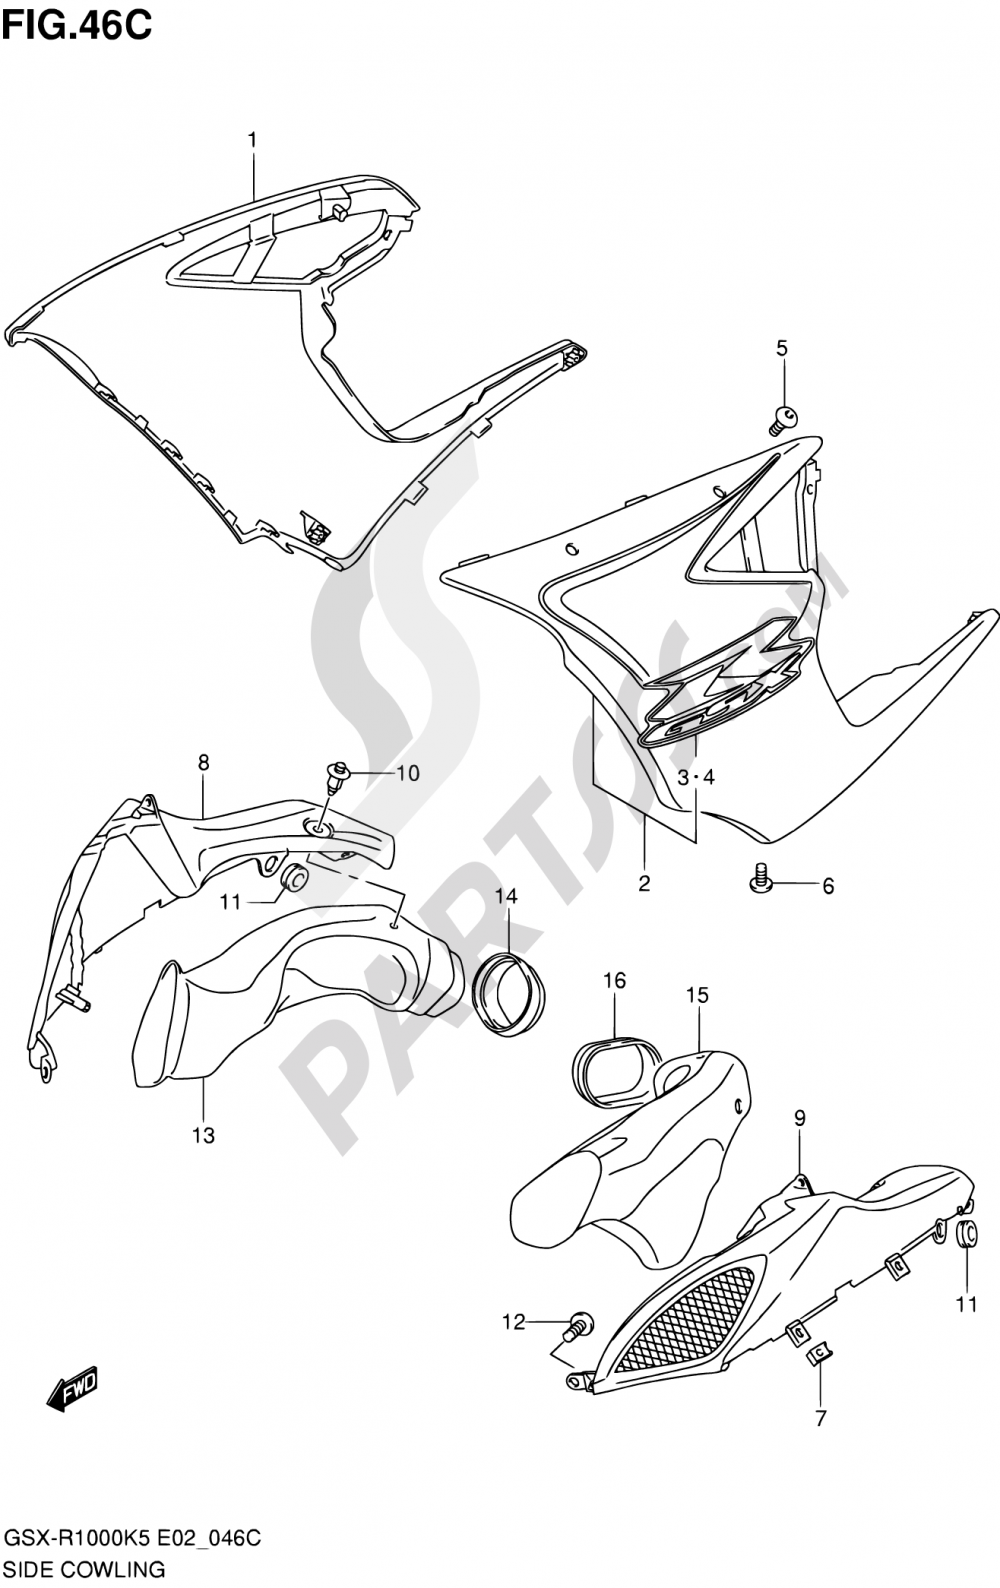 46C - SIDE COWLING (GSX-R1000U2K6 E19) Suzuki GSX-R1000 2006